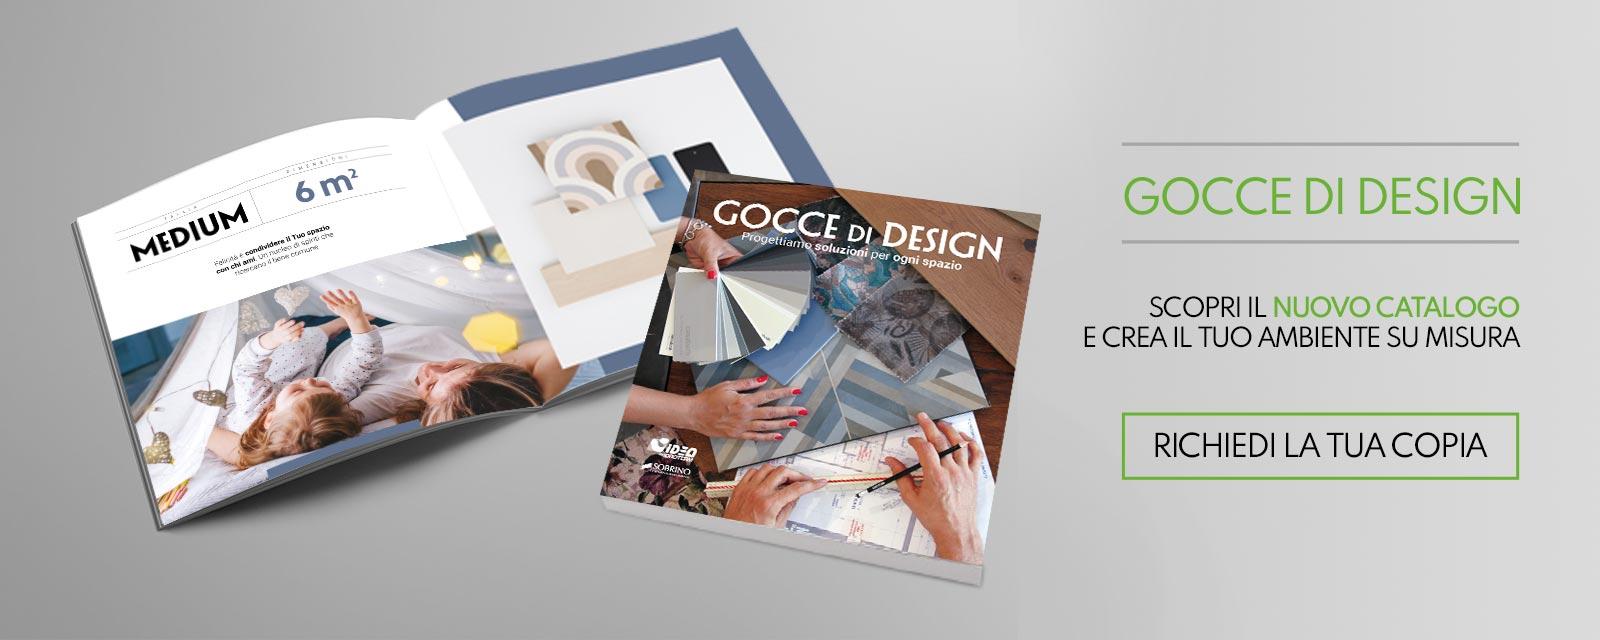 Catalogo Gocce di Design